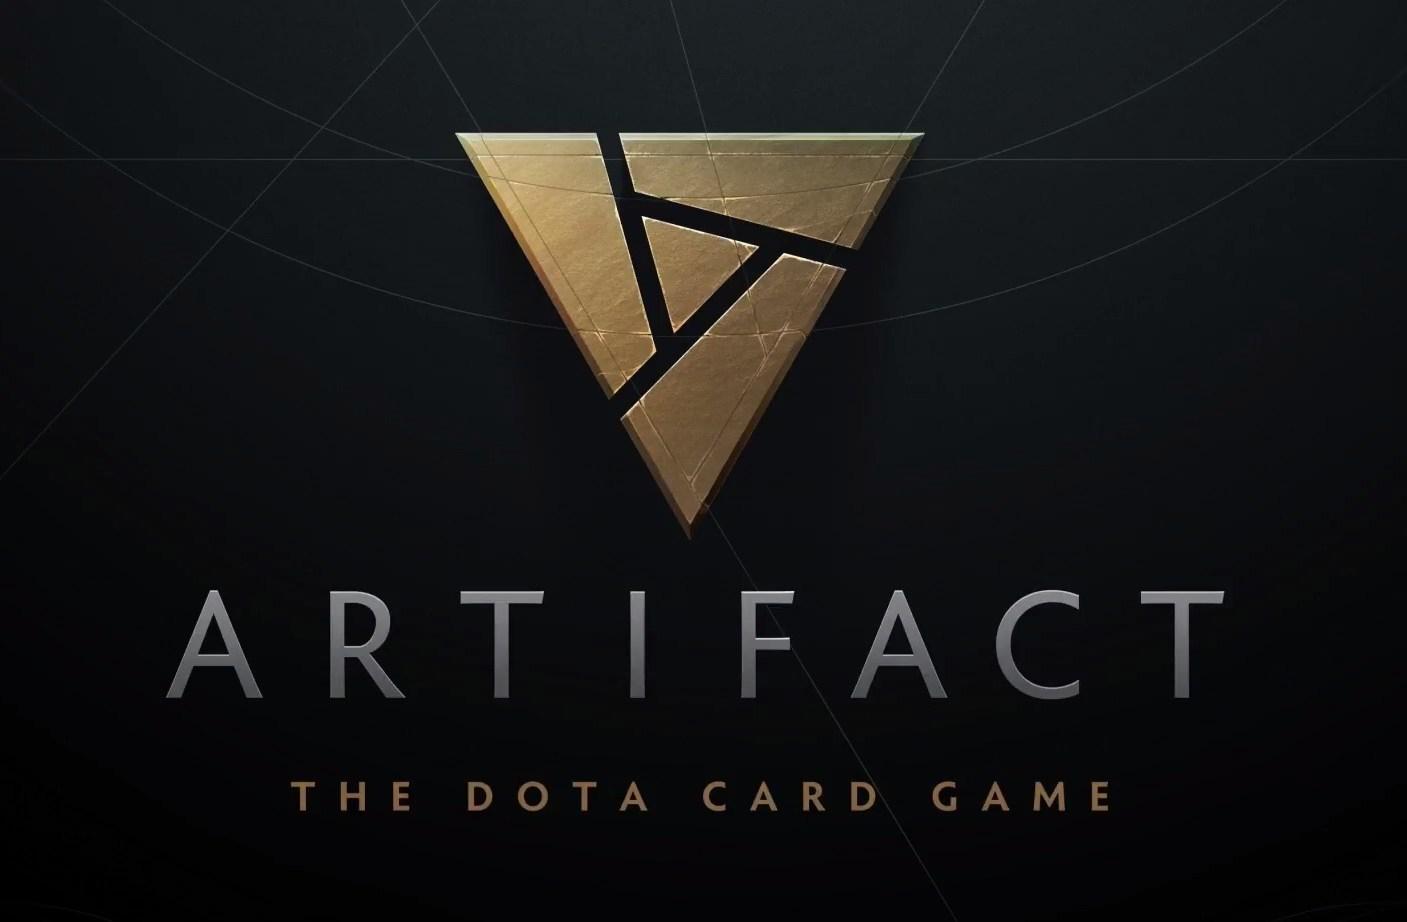 the dota card game 00